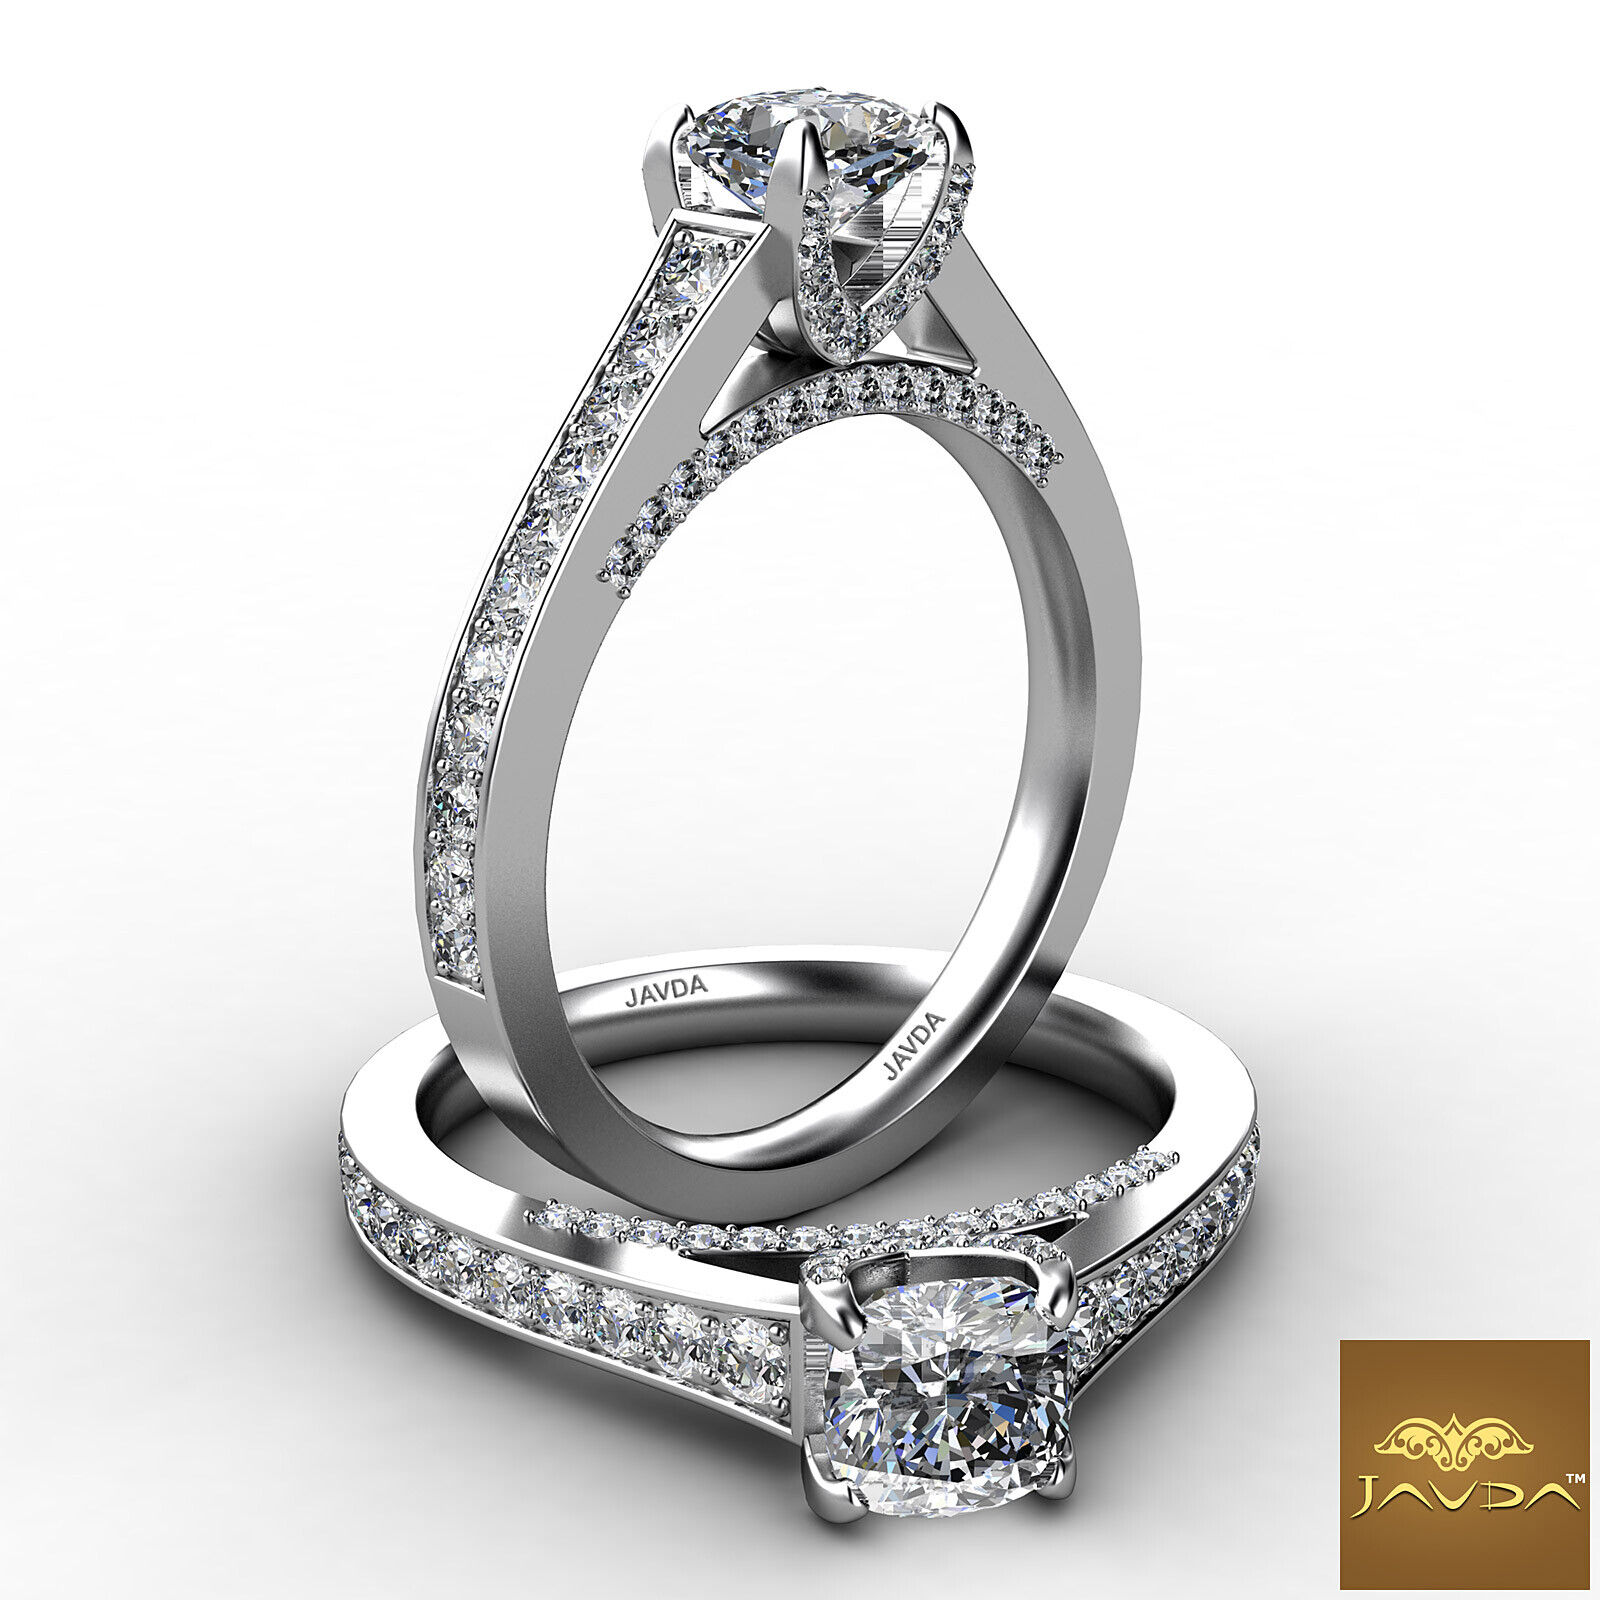 Cushion Cut Diamond Flawless Engagement GIA G VVS2 Pave Set Ring Platinum 1.25Ct